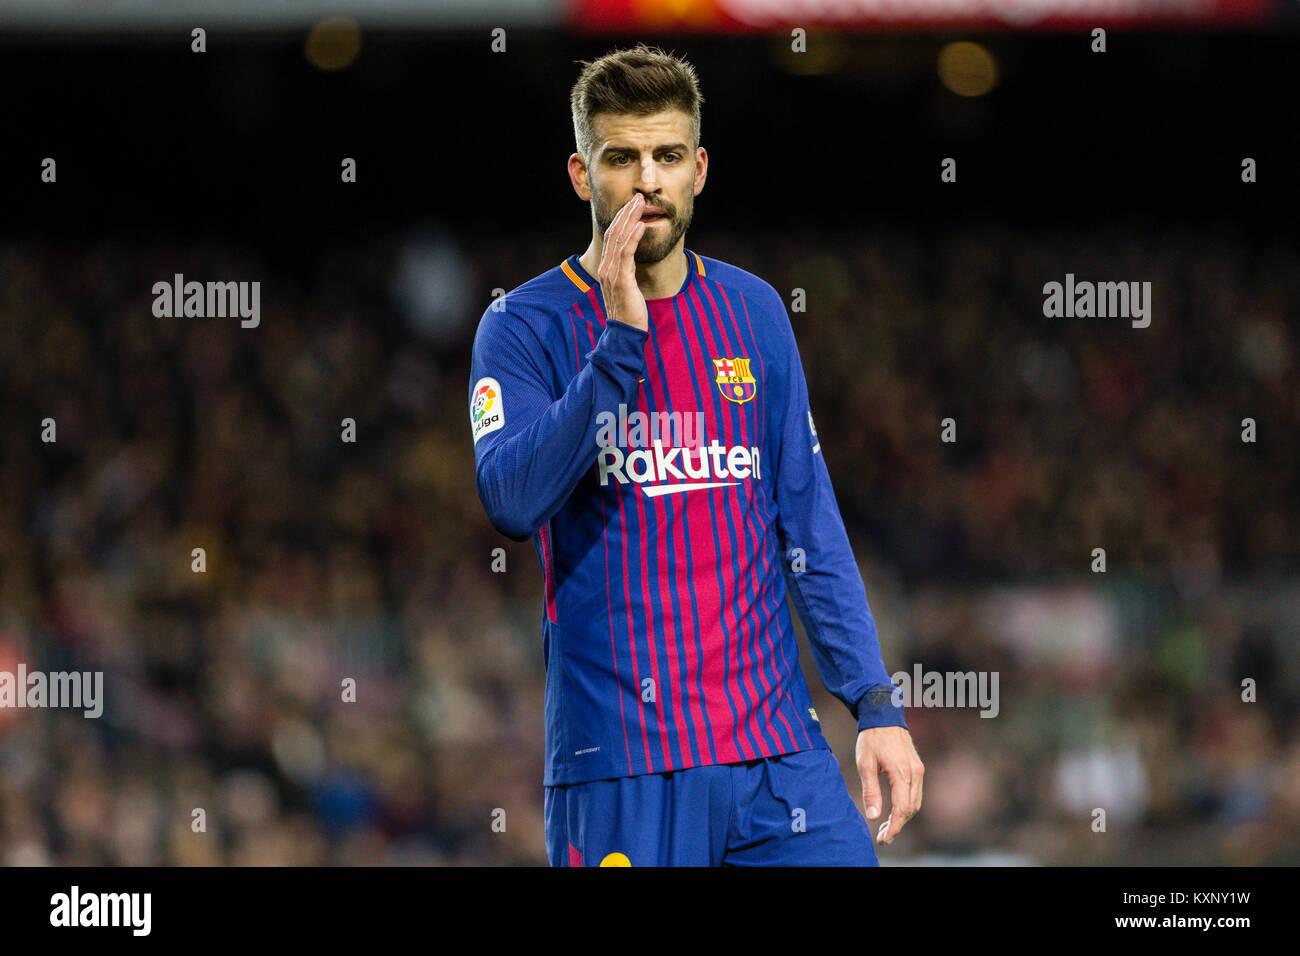 Barcelona, Spain. 11th Jan, 2018. FC Barcelona defender Gerard Pique (3) during the match between FC Barcelona against - Stock Image